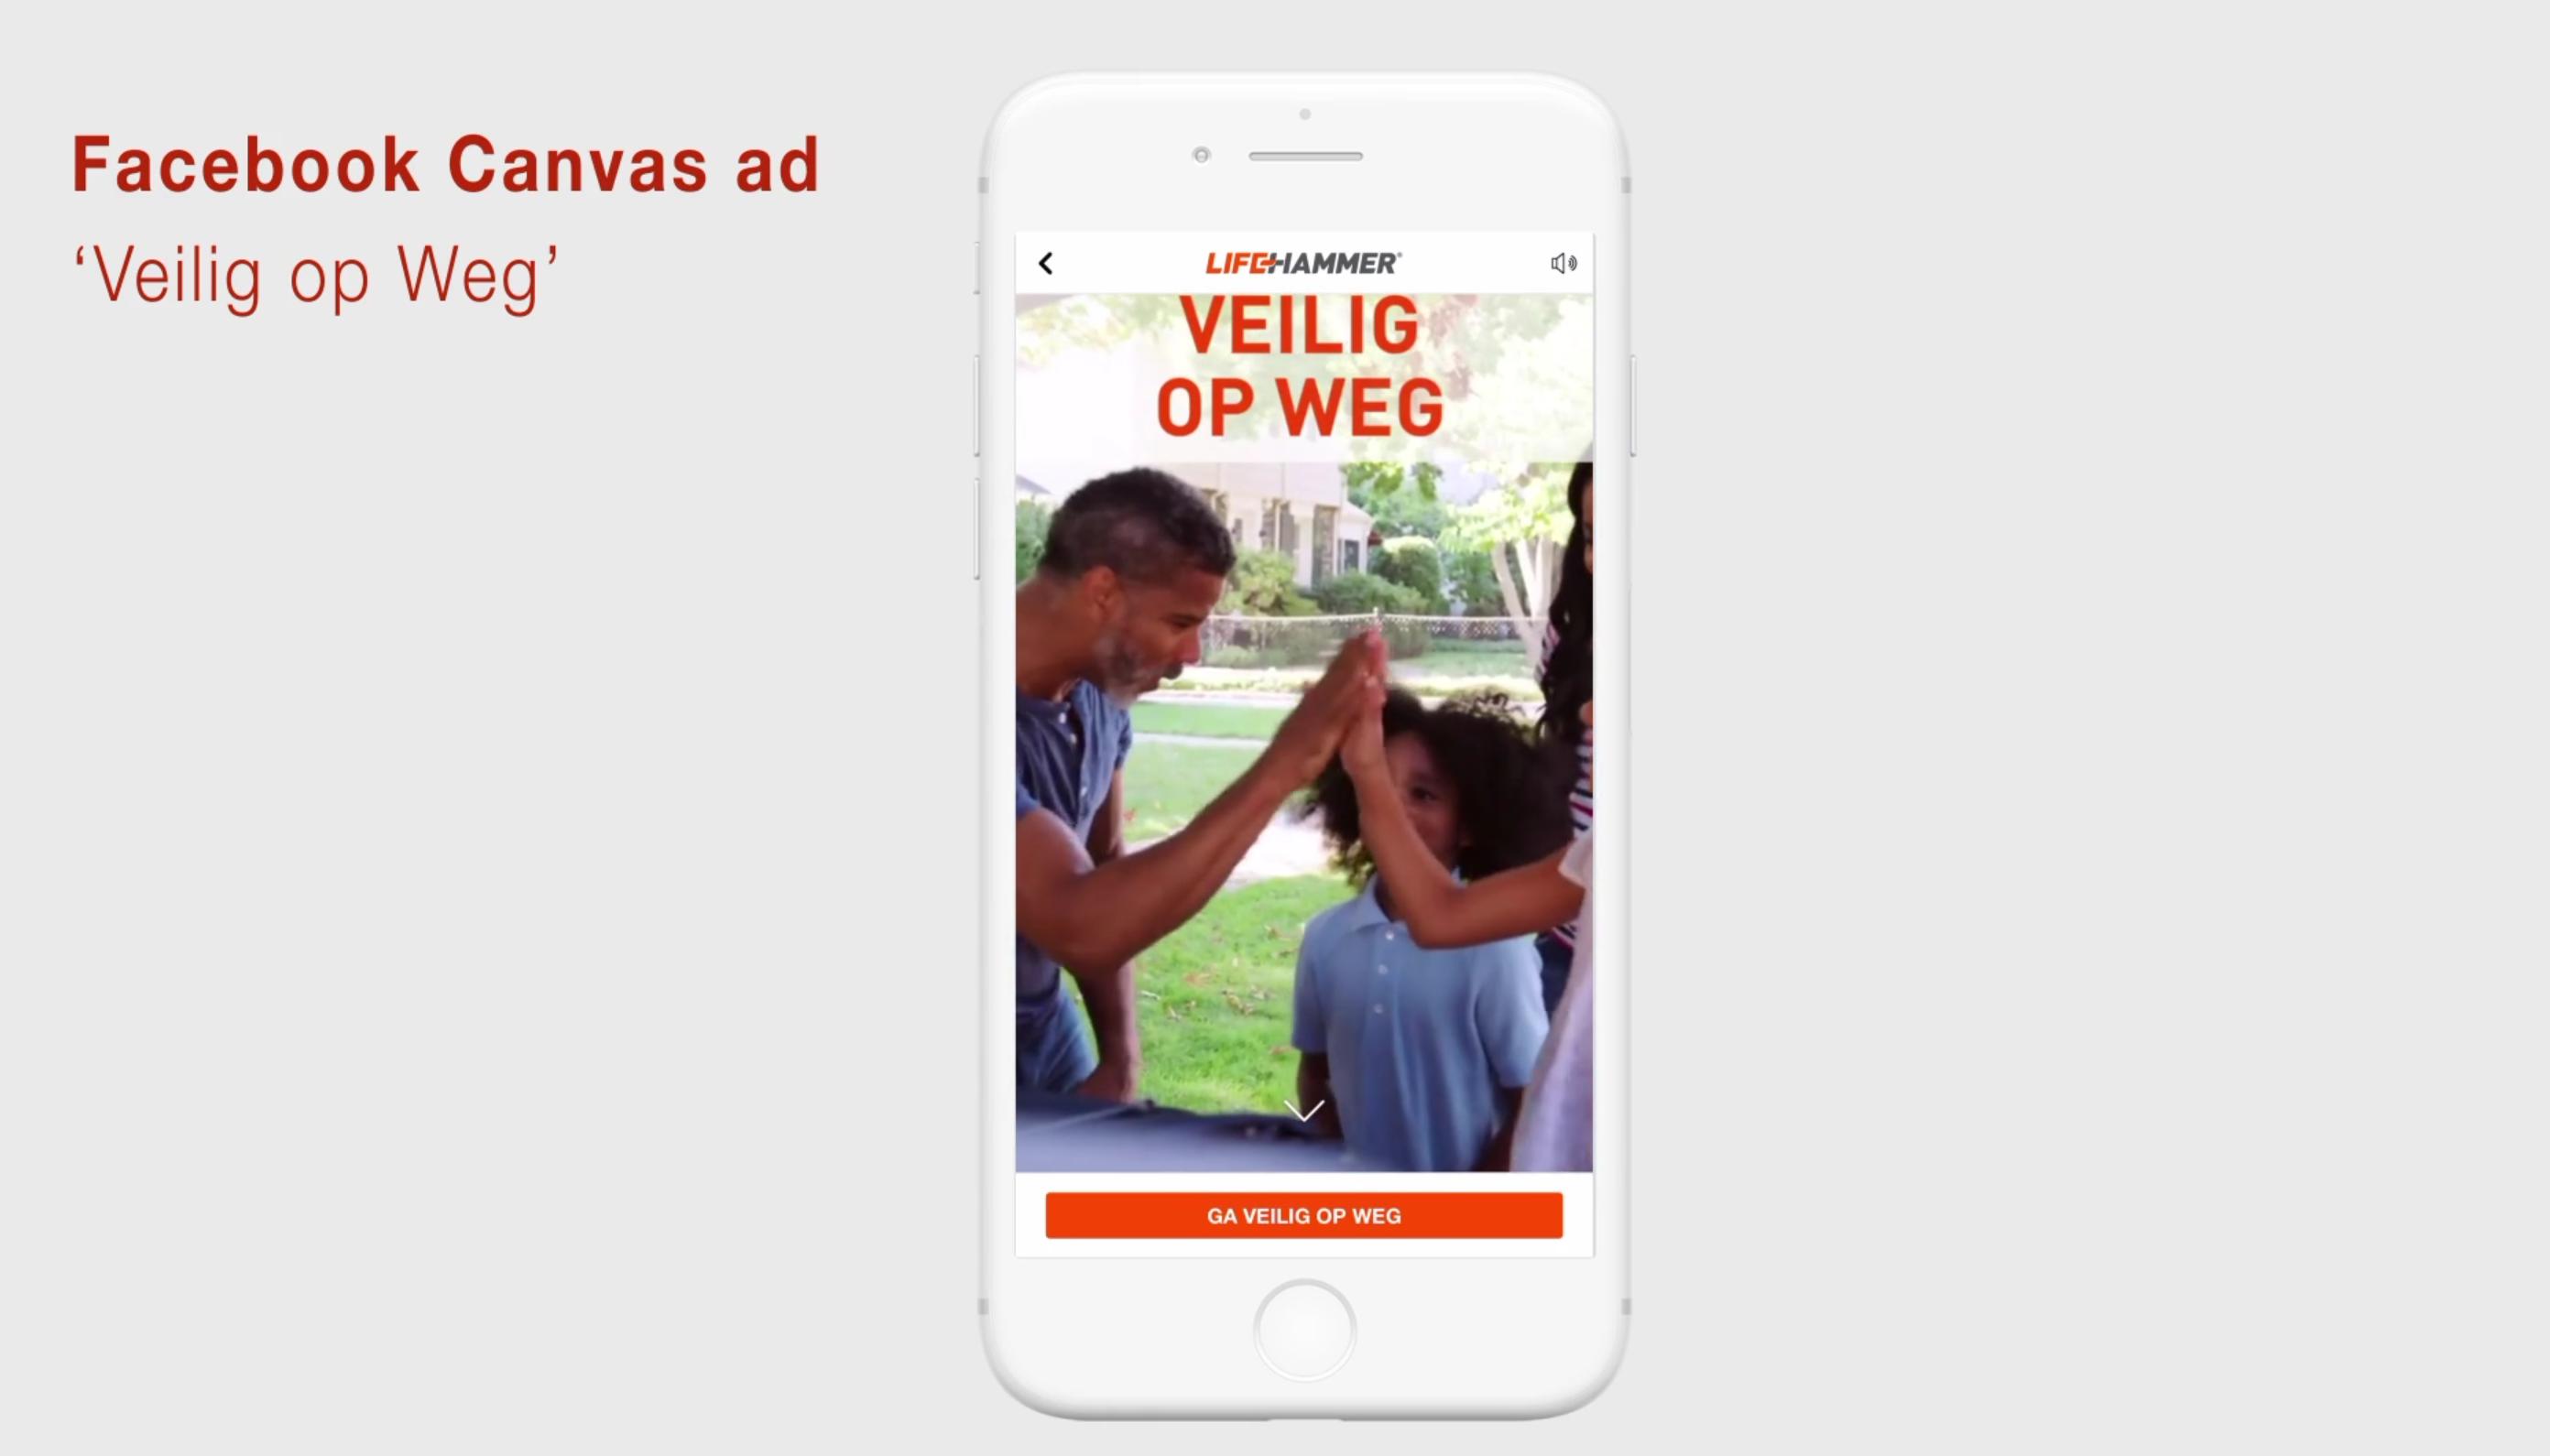 Canvas ad